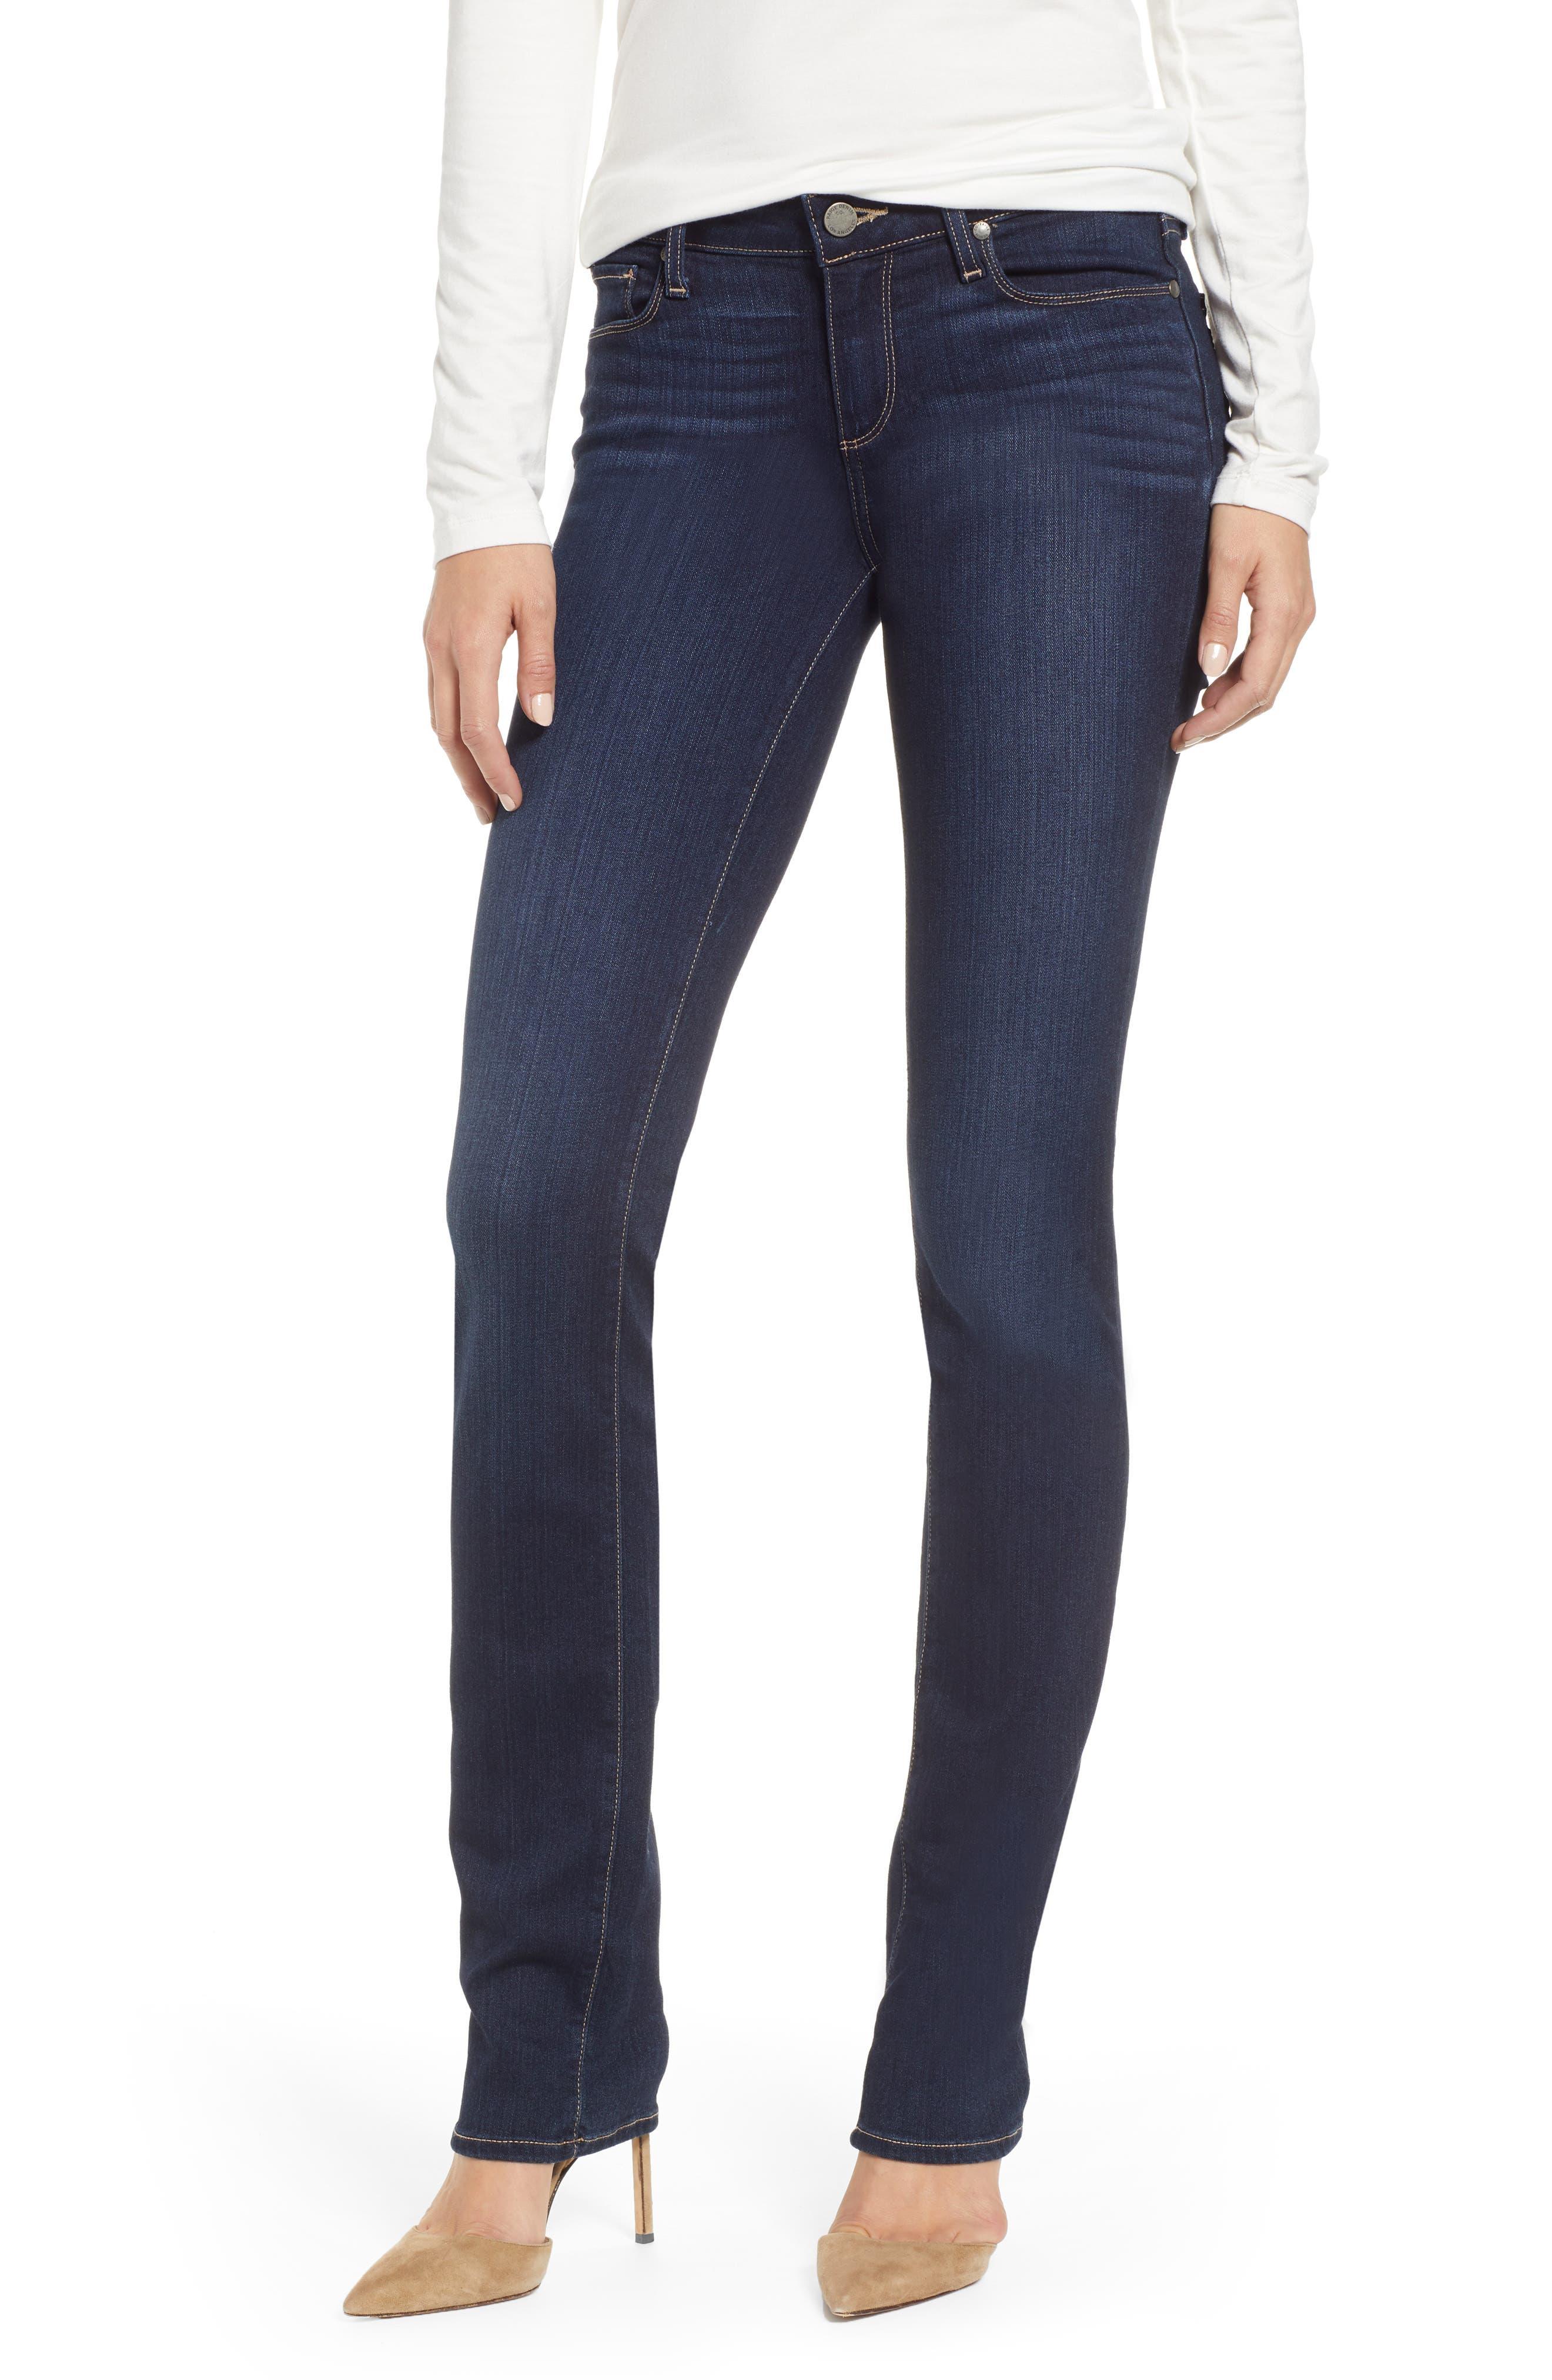 Transcend - Skyline Straight Leg Jeans,                         Main,                         color, GARDENA